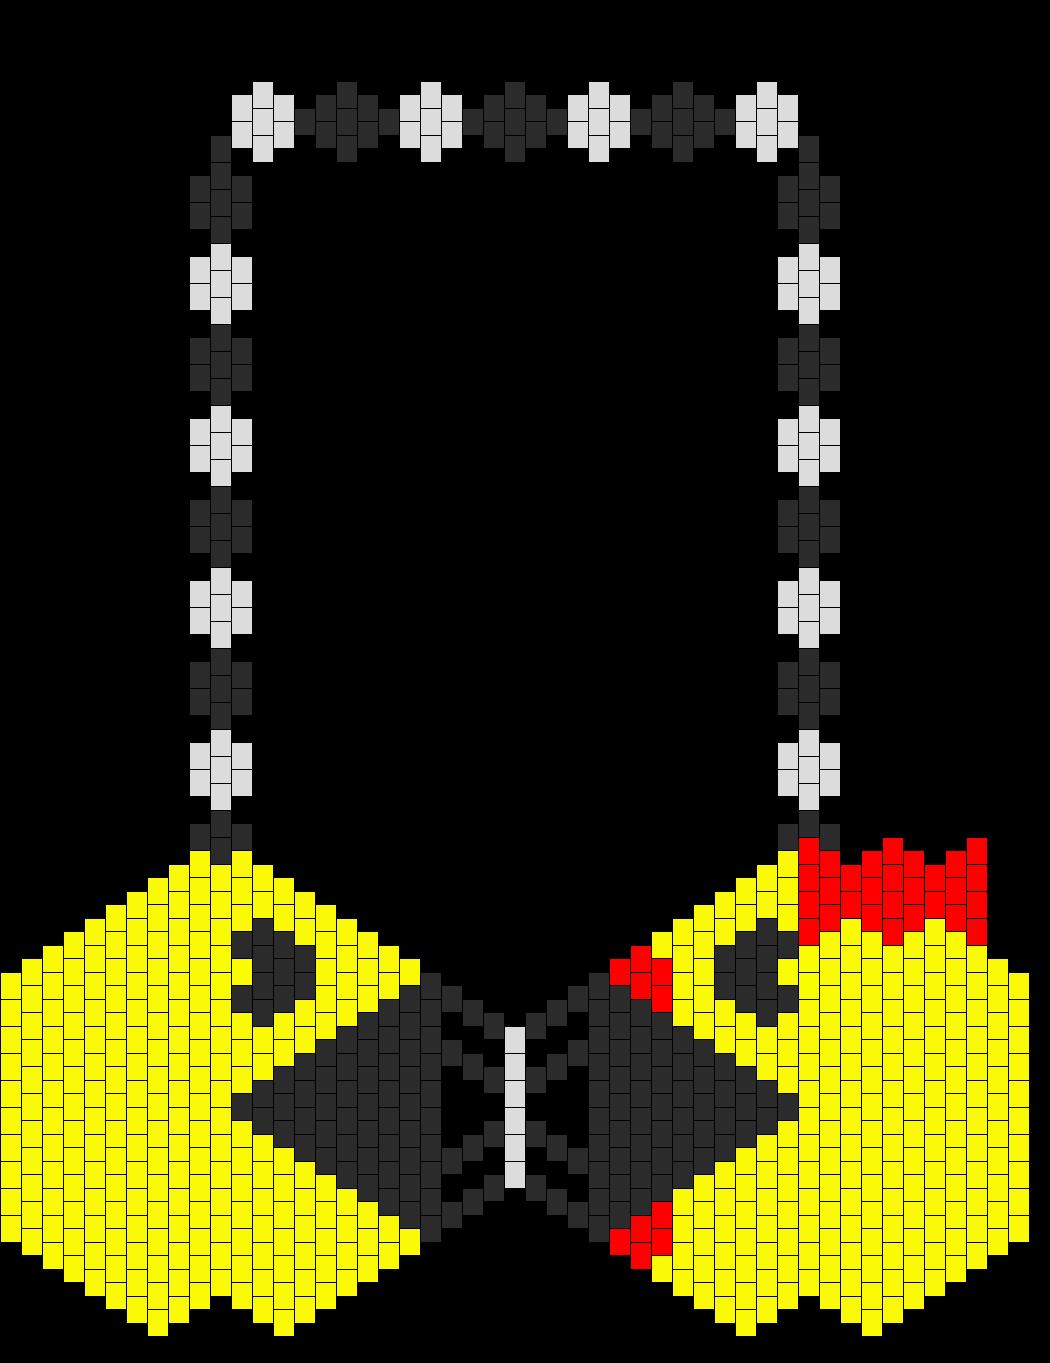 Pacman Vs Ms Pacman Kandi Bikini Bra Bead Pattern